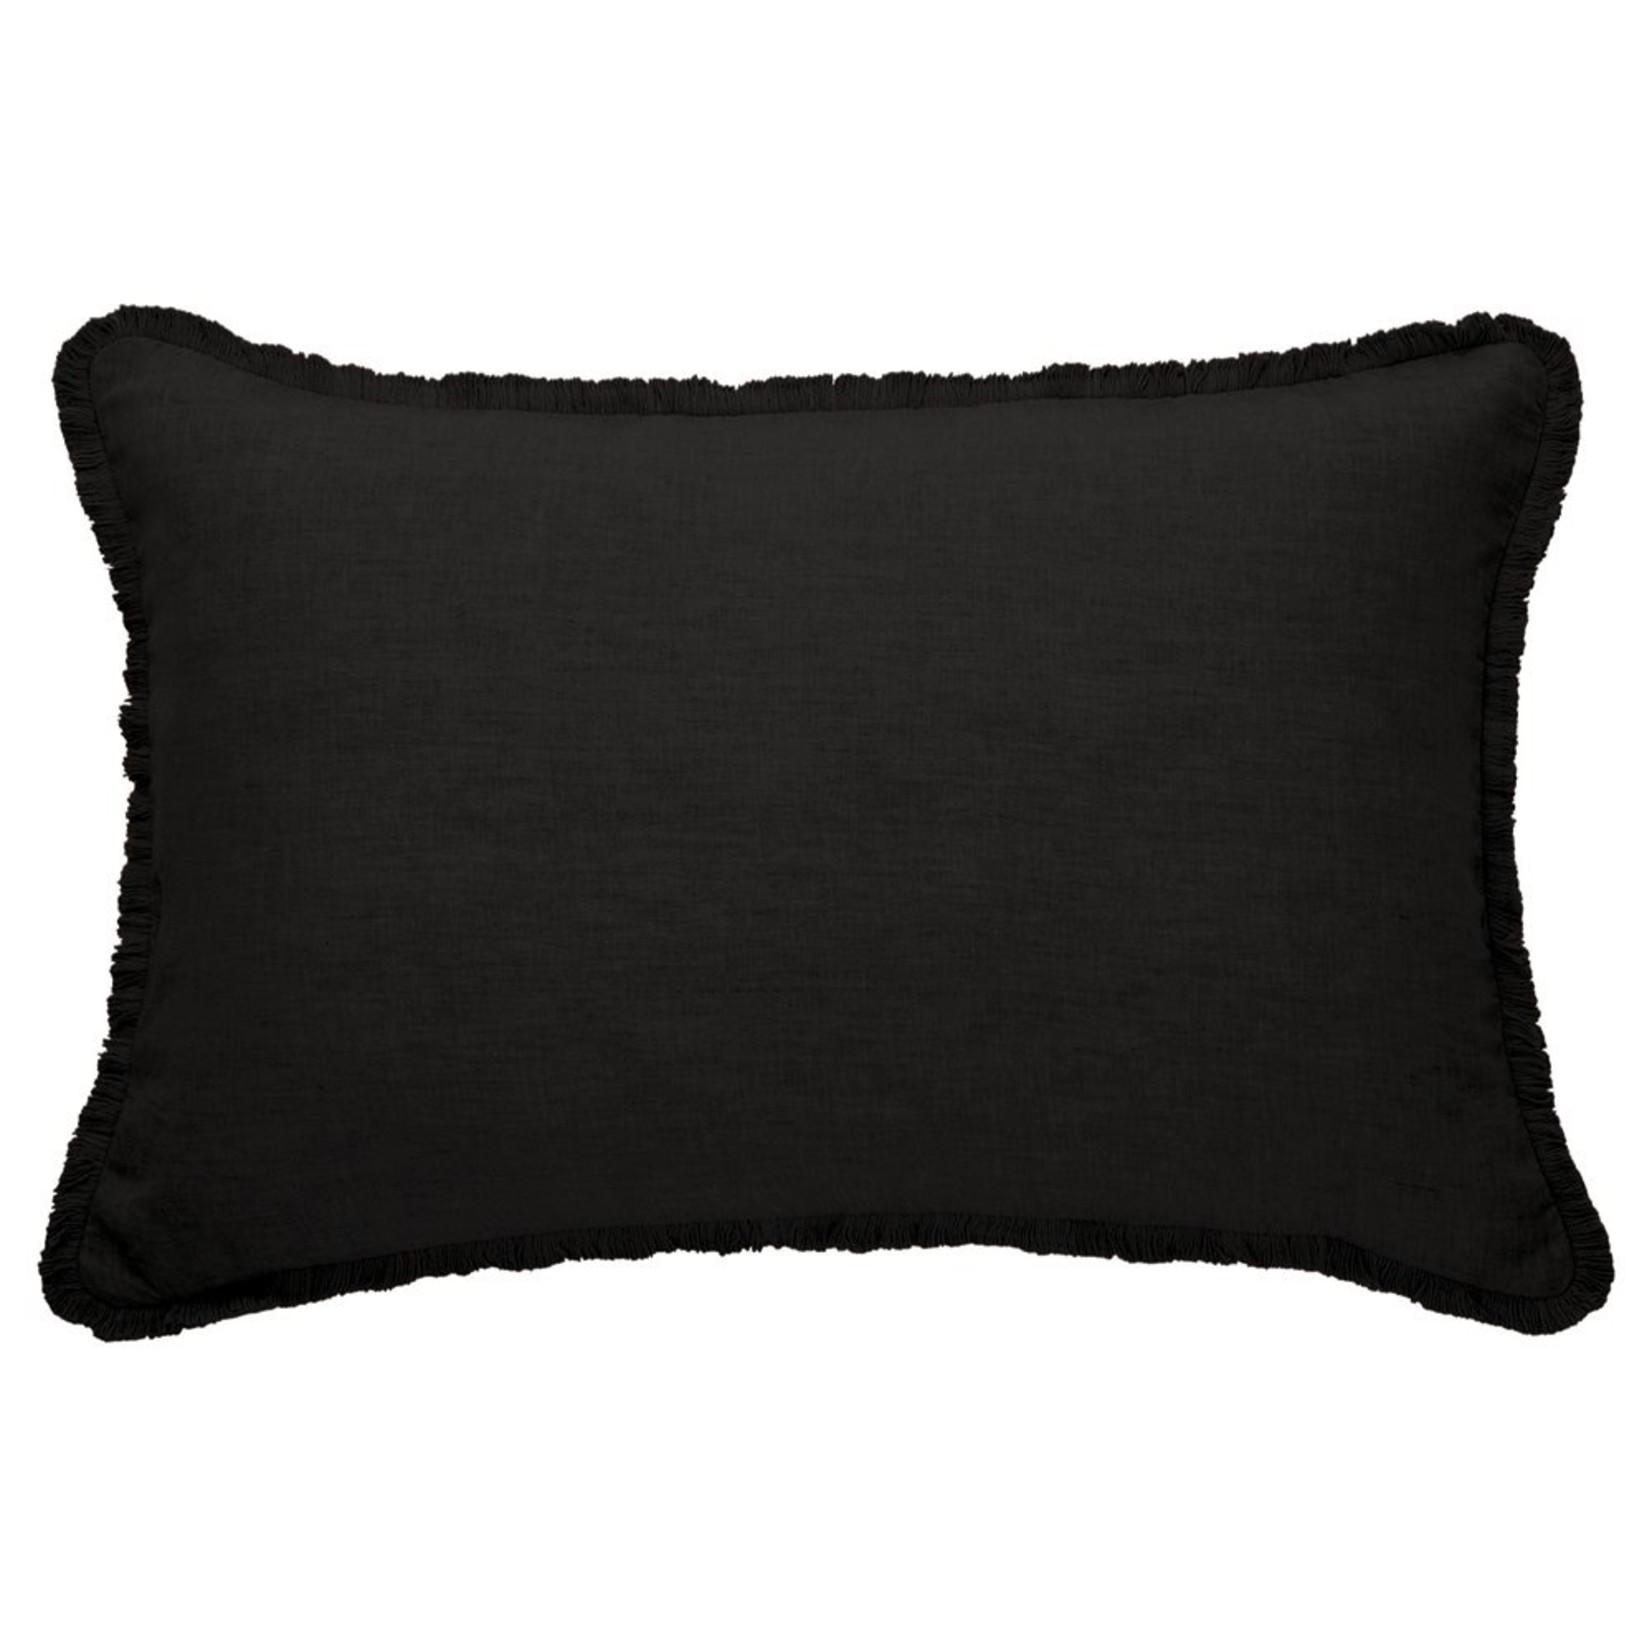 "Brunelli Linen Black Oblong Cushion 16""x24"""